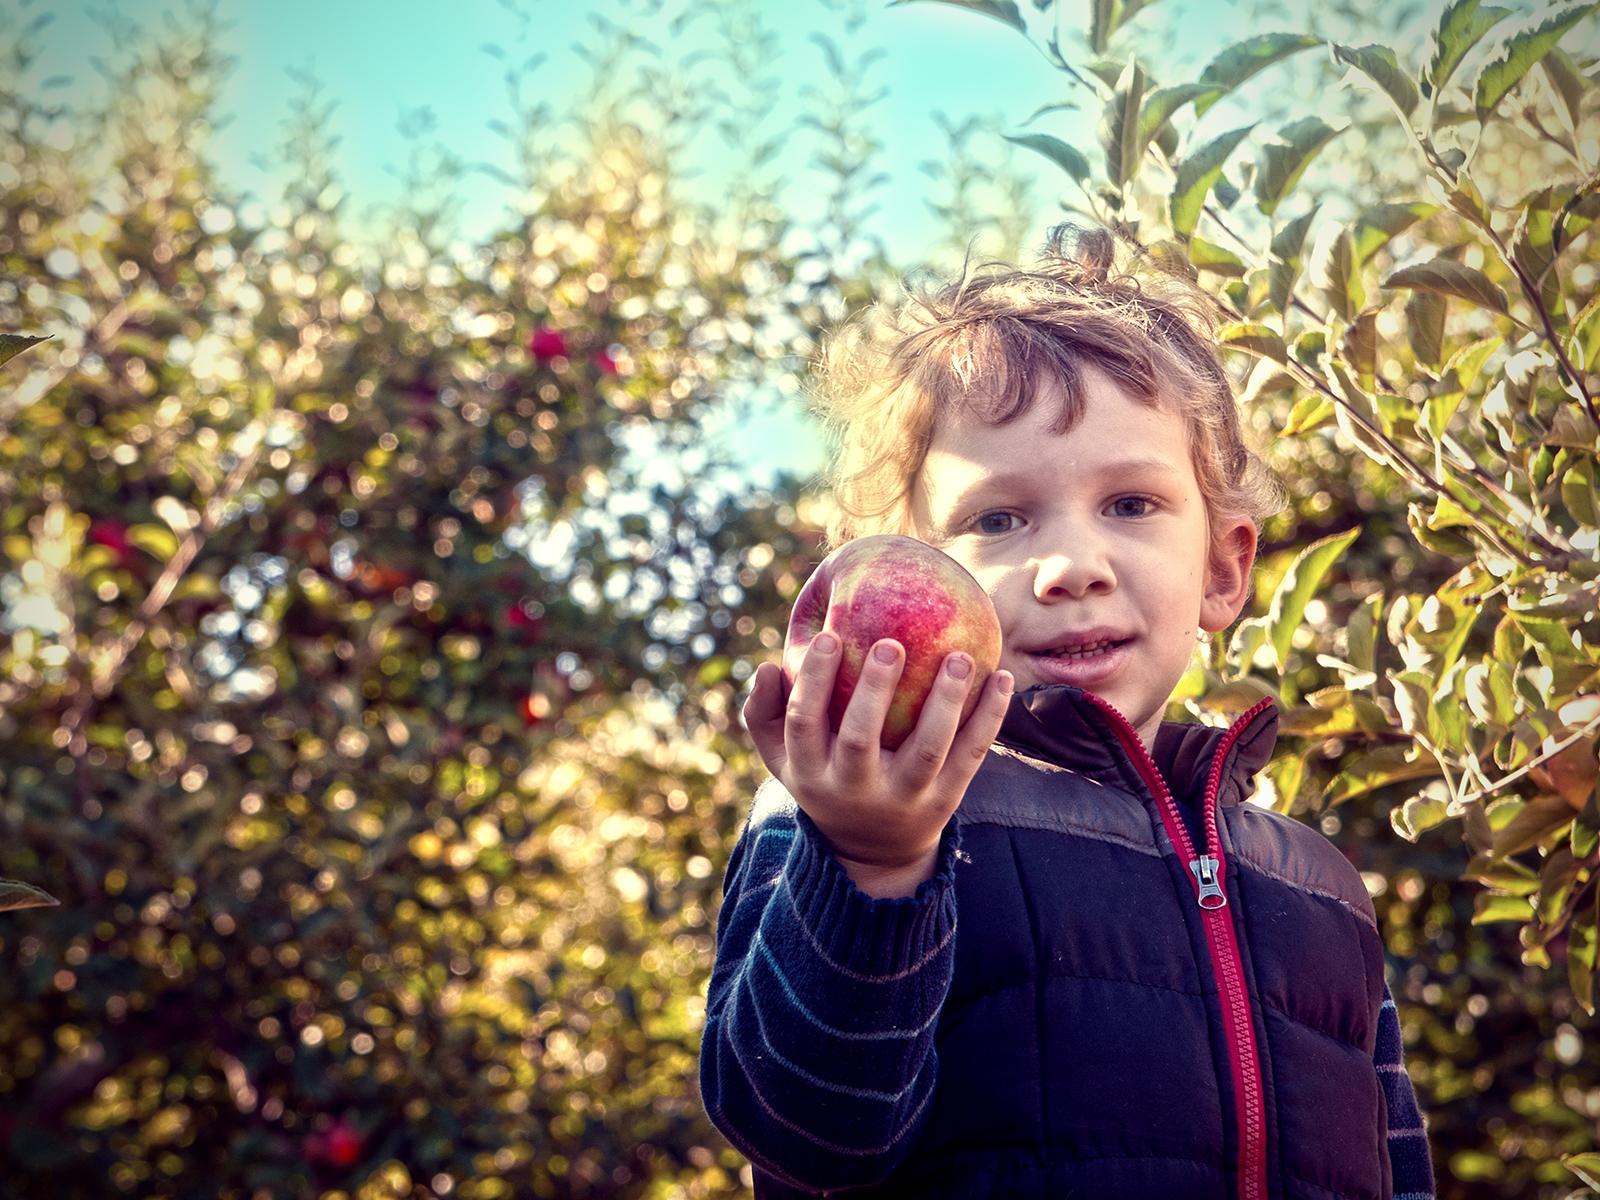 Love Those Apples. charles i. letbetter